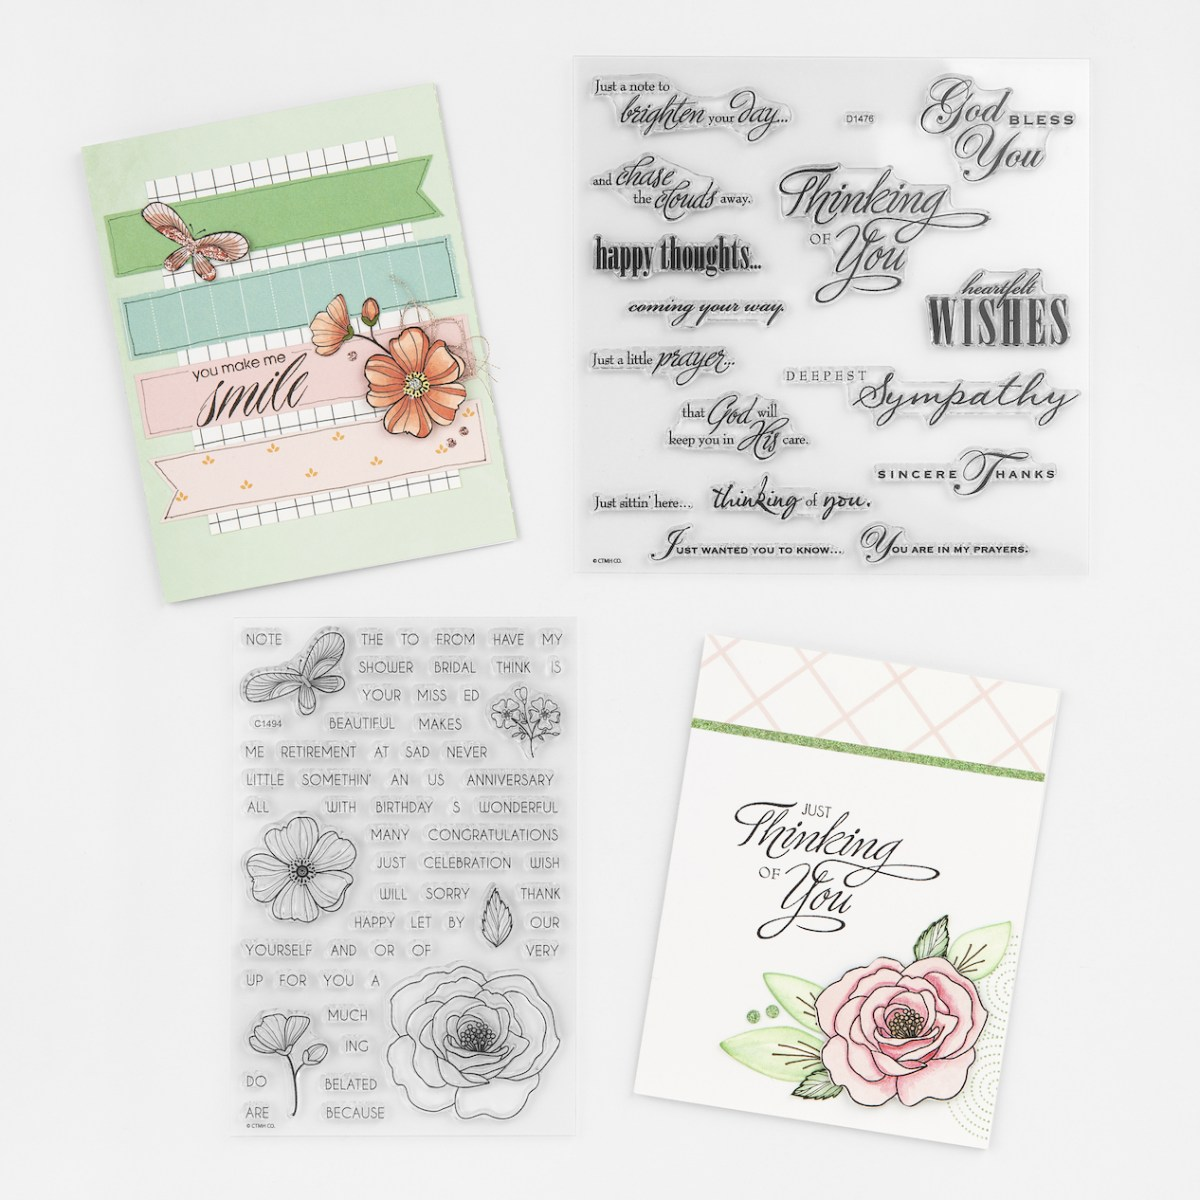 Stamptacular Sale #ctmh #closetomyheart #sale #stamps #diy #cardmaking #scrapbooking #papercrafting #stamptacular #myacrylix #thincuts #diecutting #cuttlebug #thinkingofyou #youmakemesmile #cardchattersympathy #sympathy #cardwordpuzzle